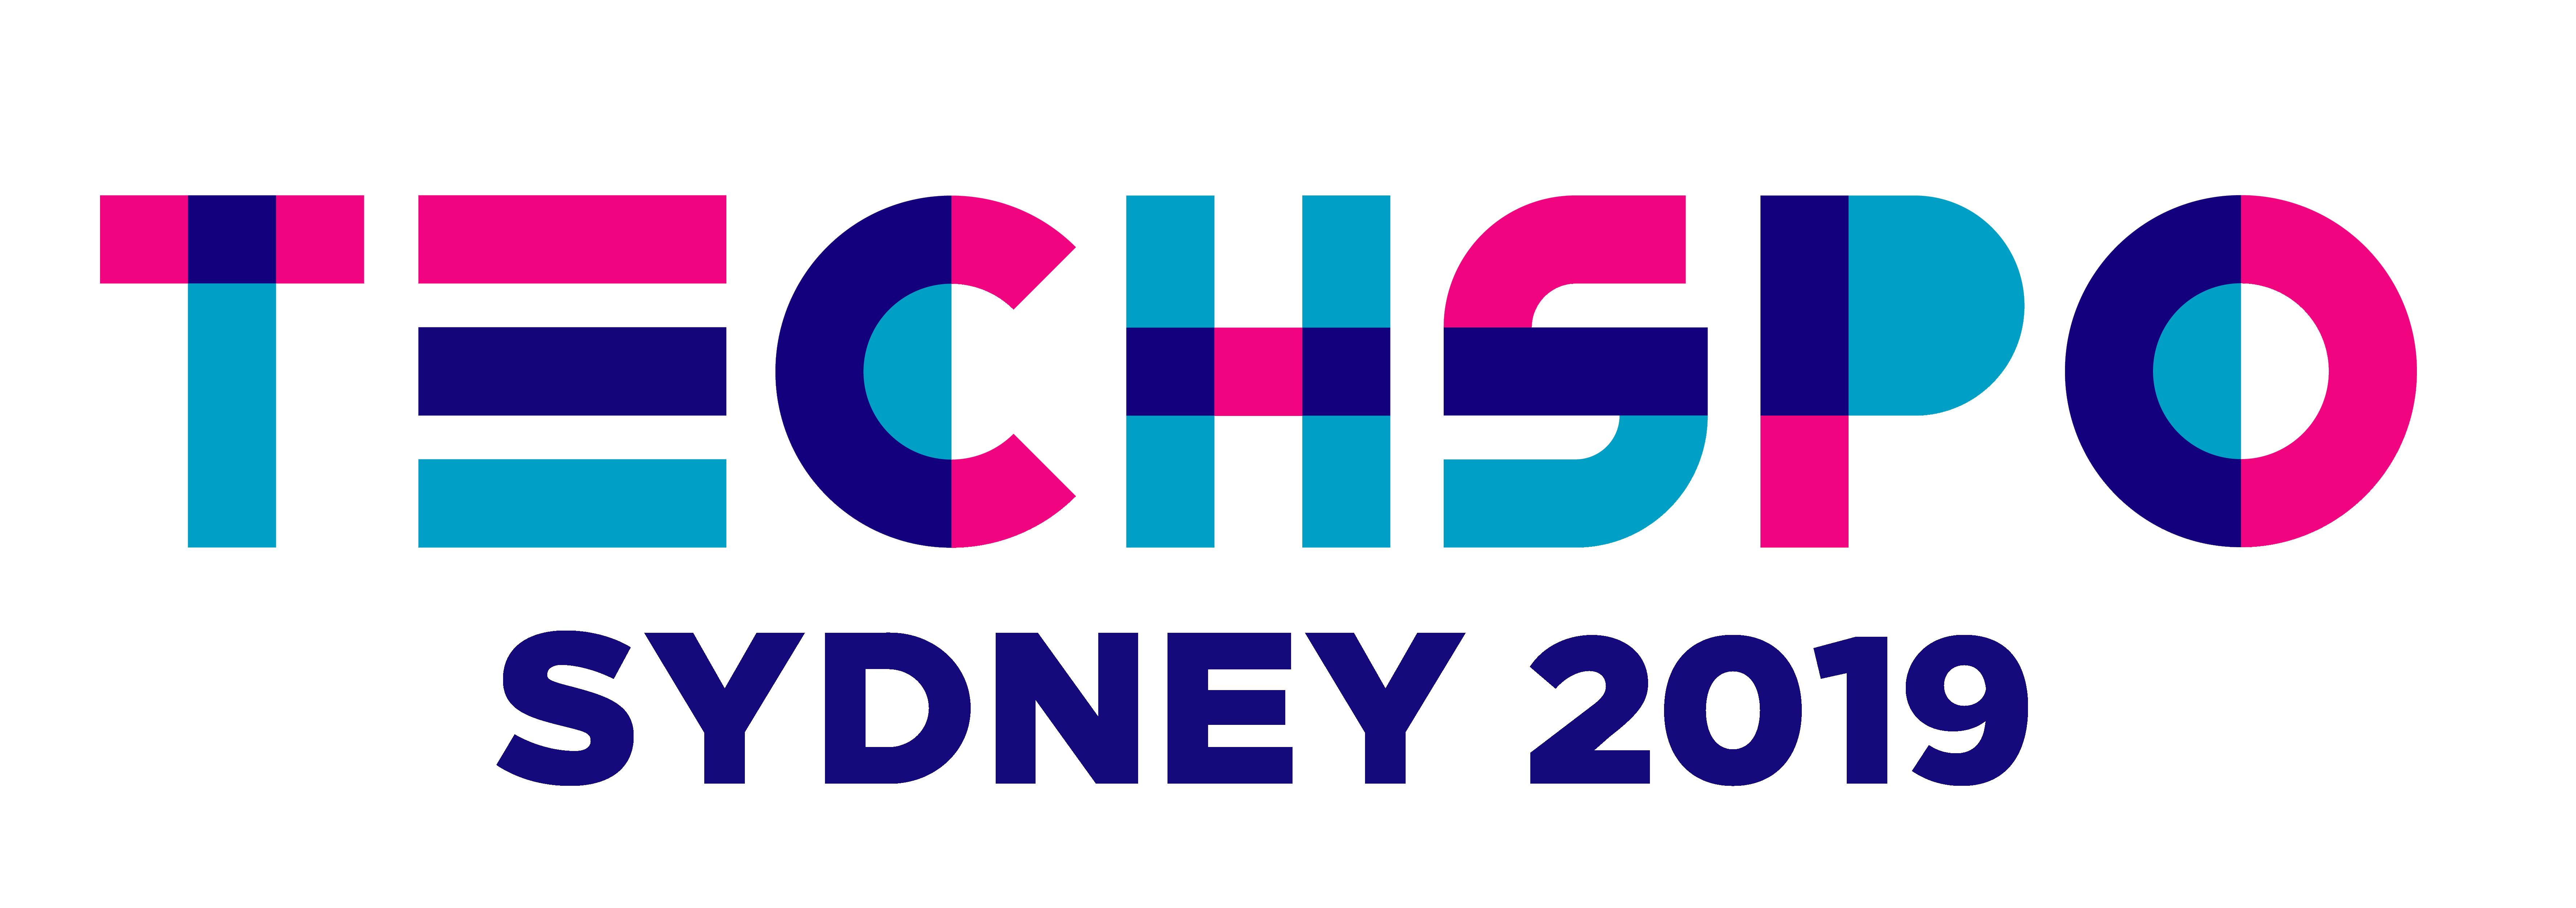 TECHSPO Sydney 2020